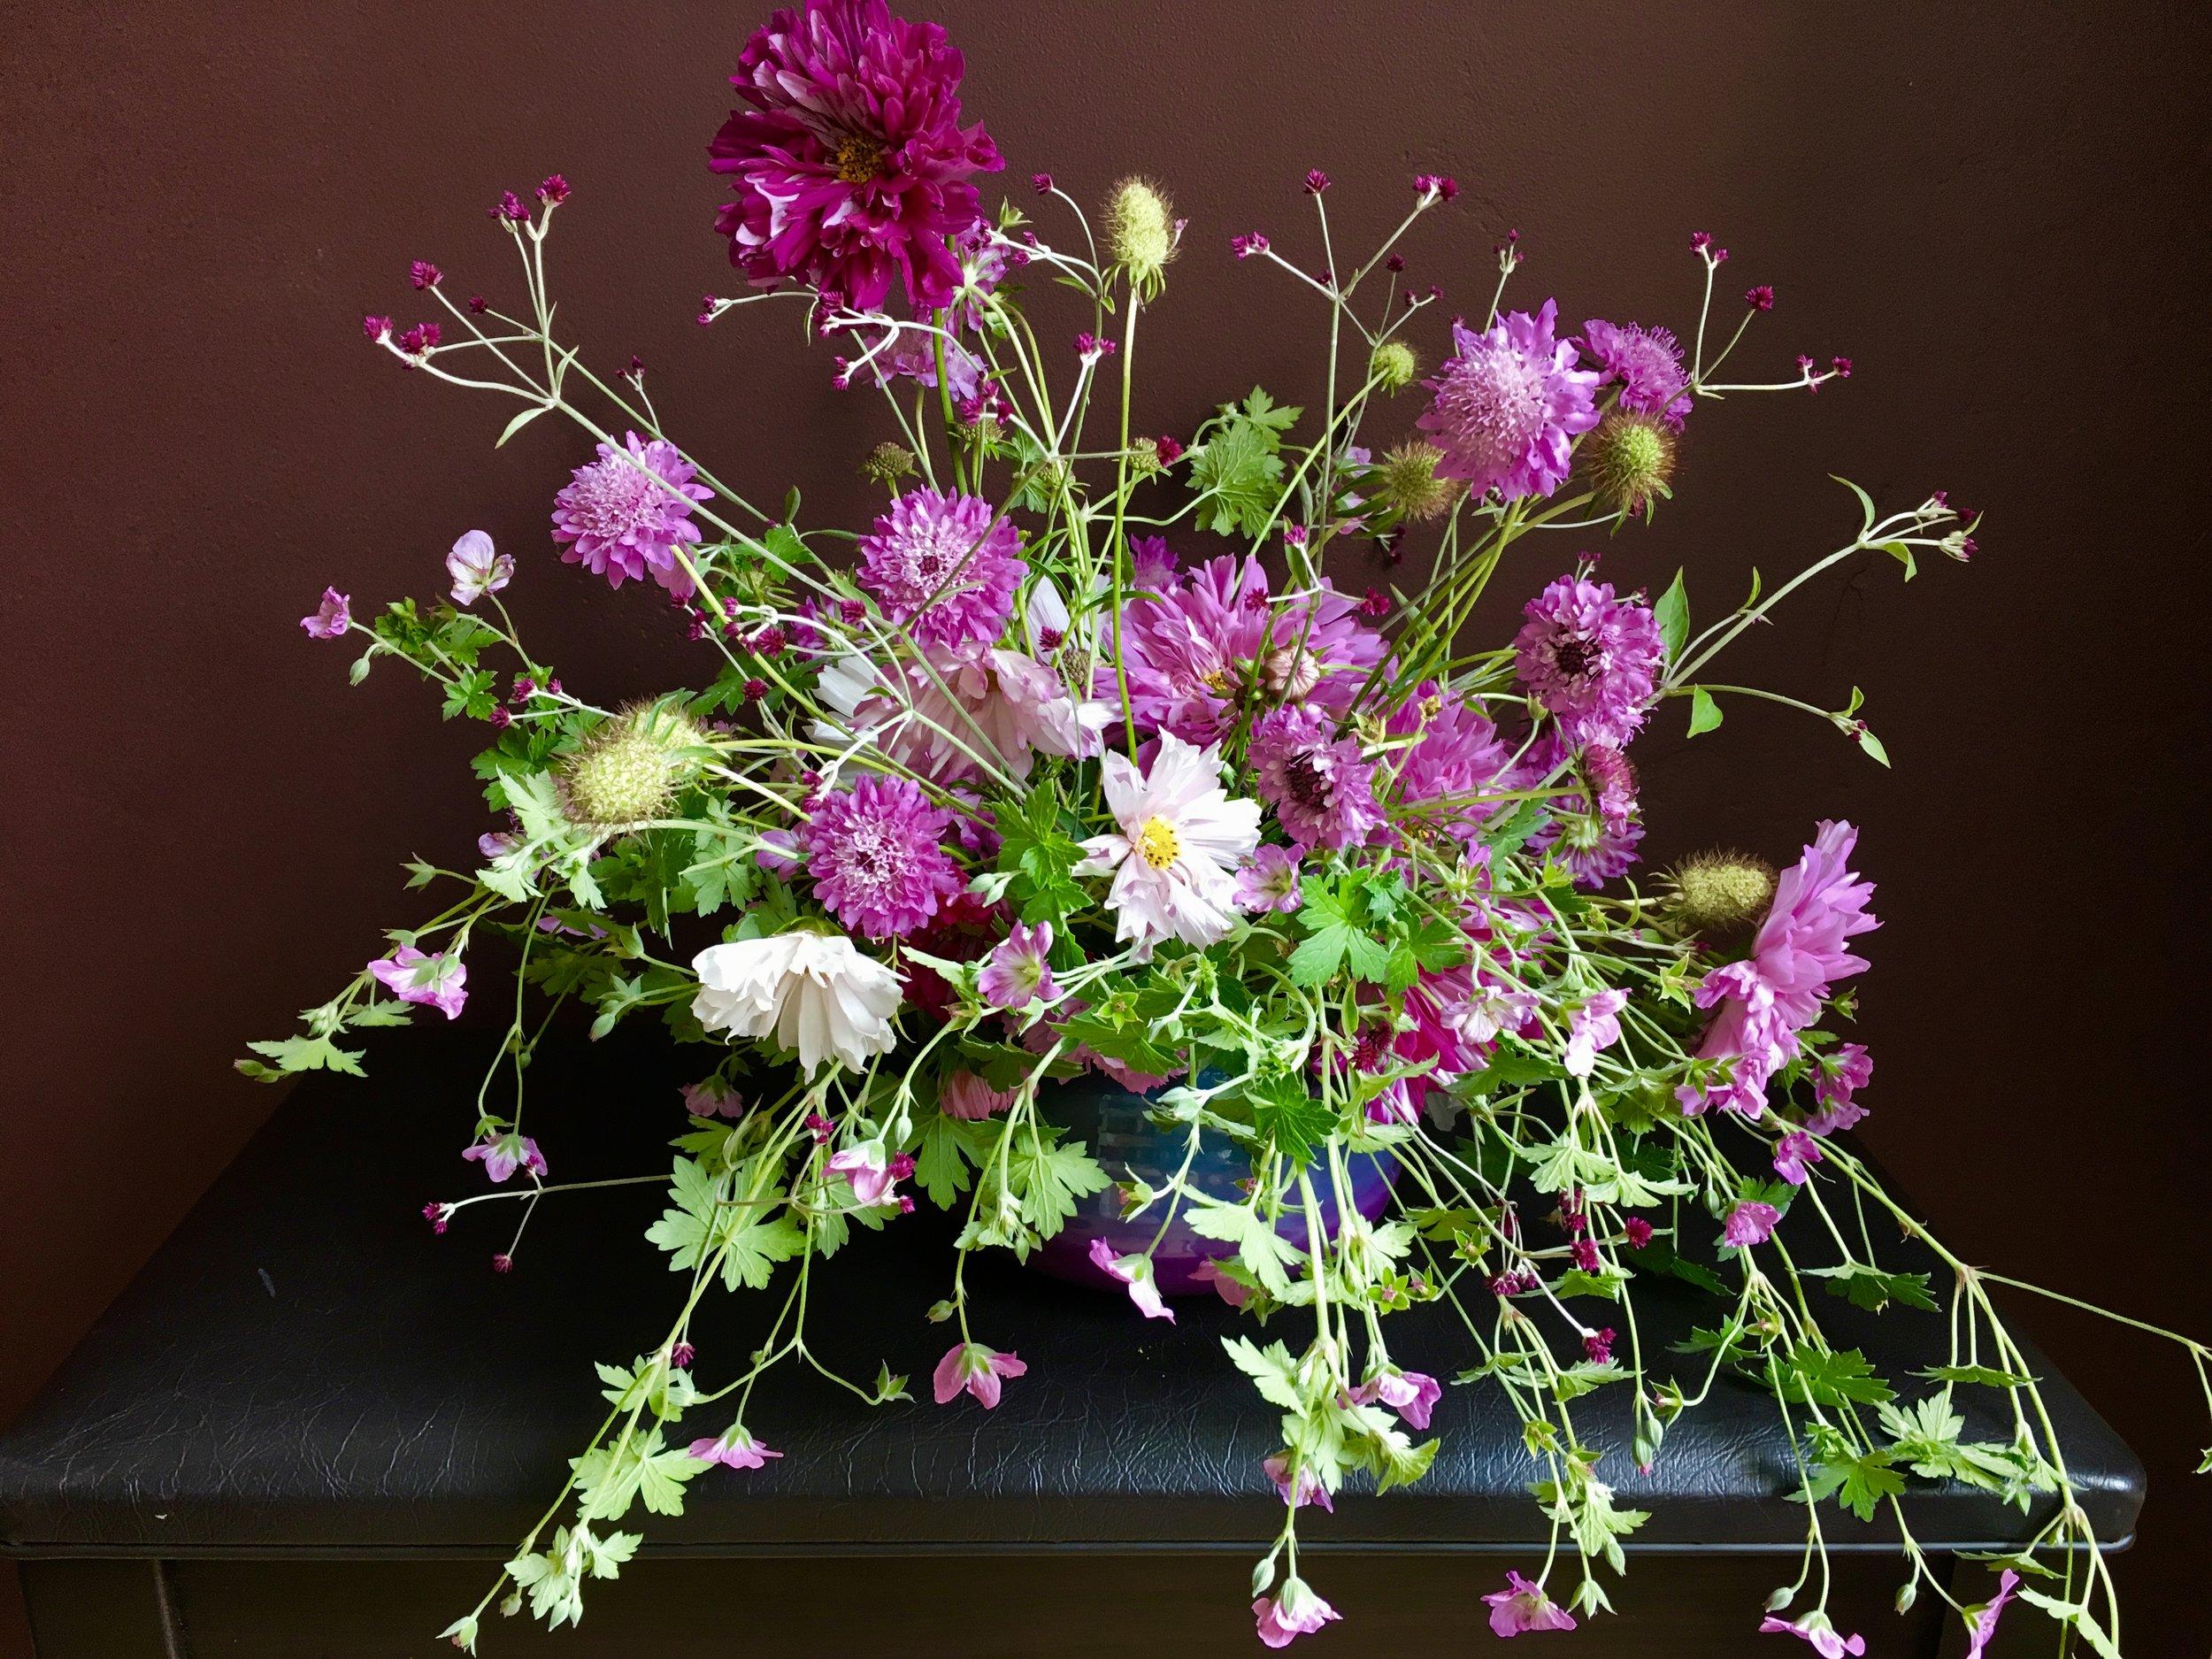 Cosmos, 'Mavis Simpson' geranium, scabiosa and gomphrena 'Airy Bachelor Buttons.'